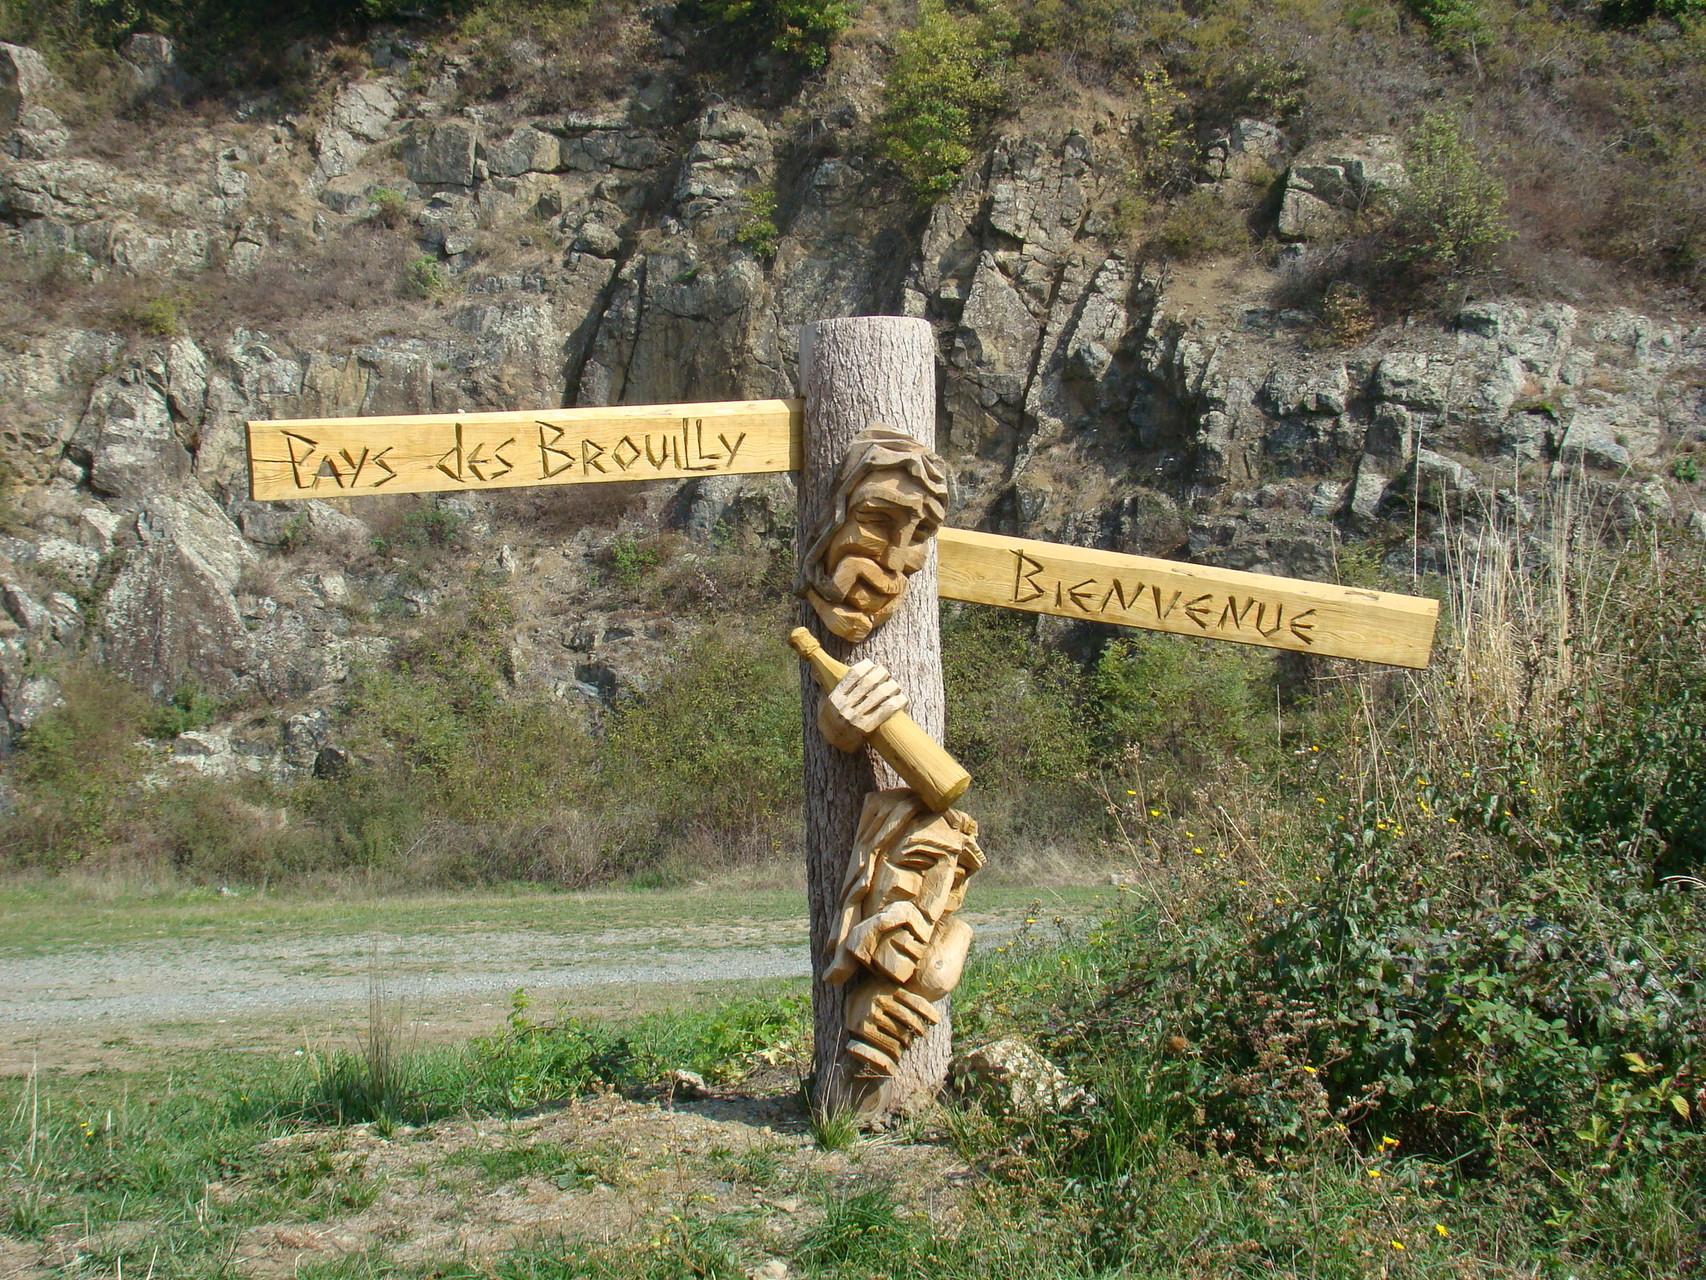 St Lager (Beaujolais